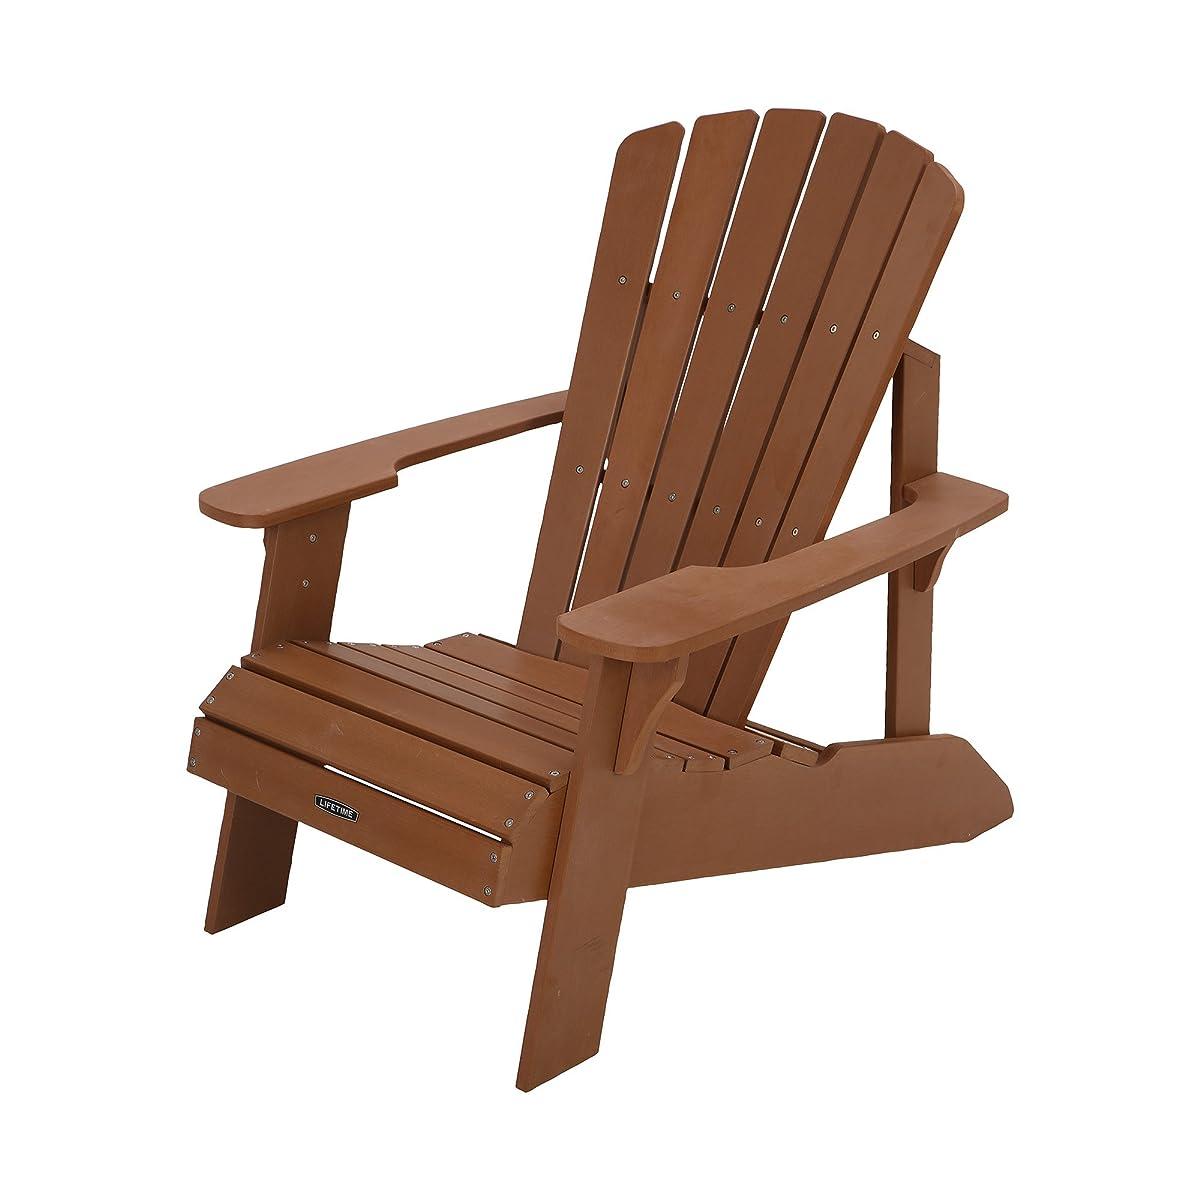 Lifetime Faux Wood Adirondack Chair, Light Brown - 60064